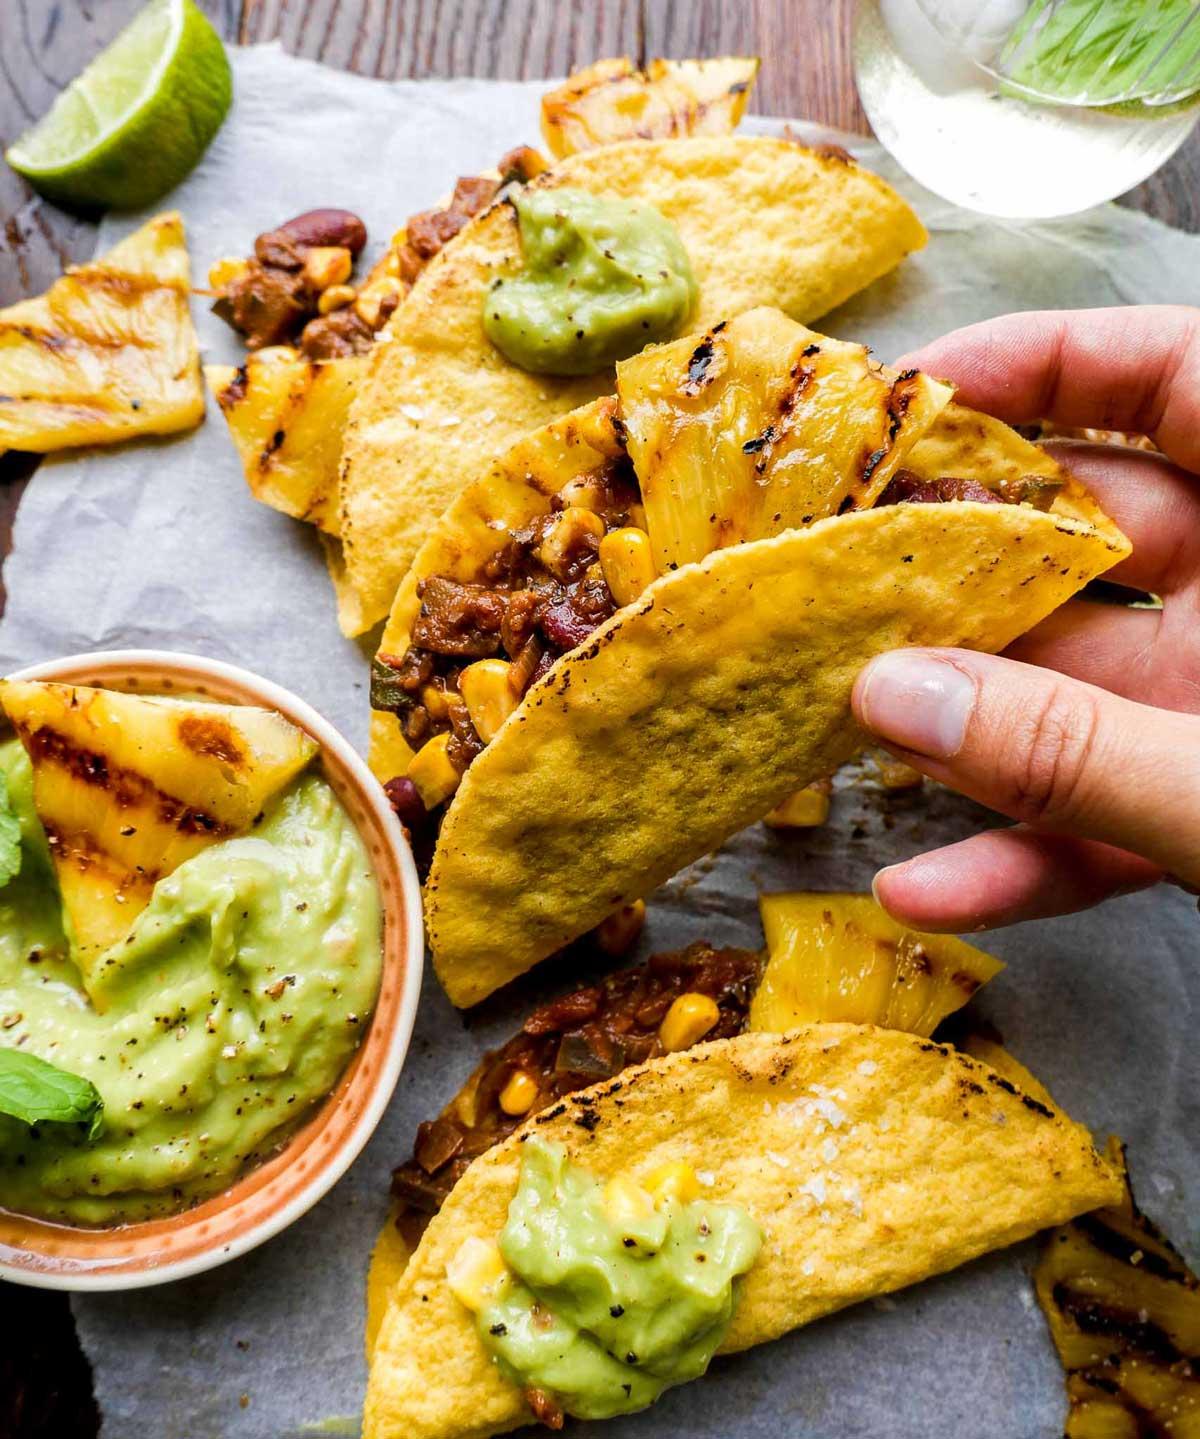 grillet ananas i tacos med guacamole